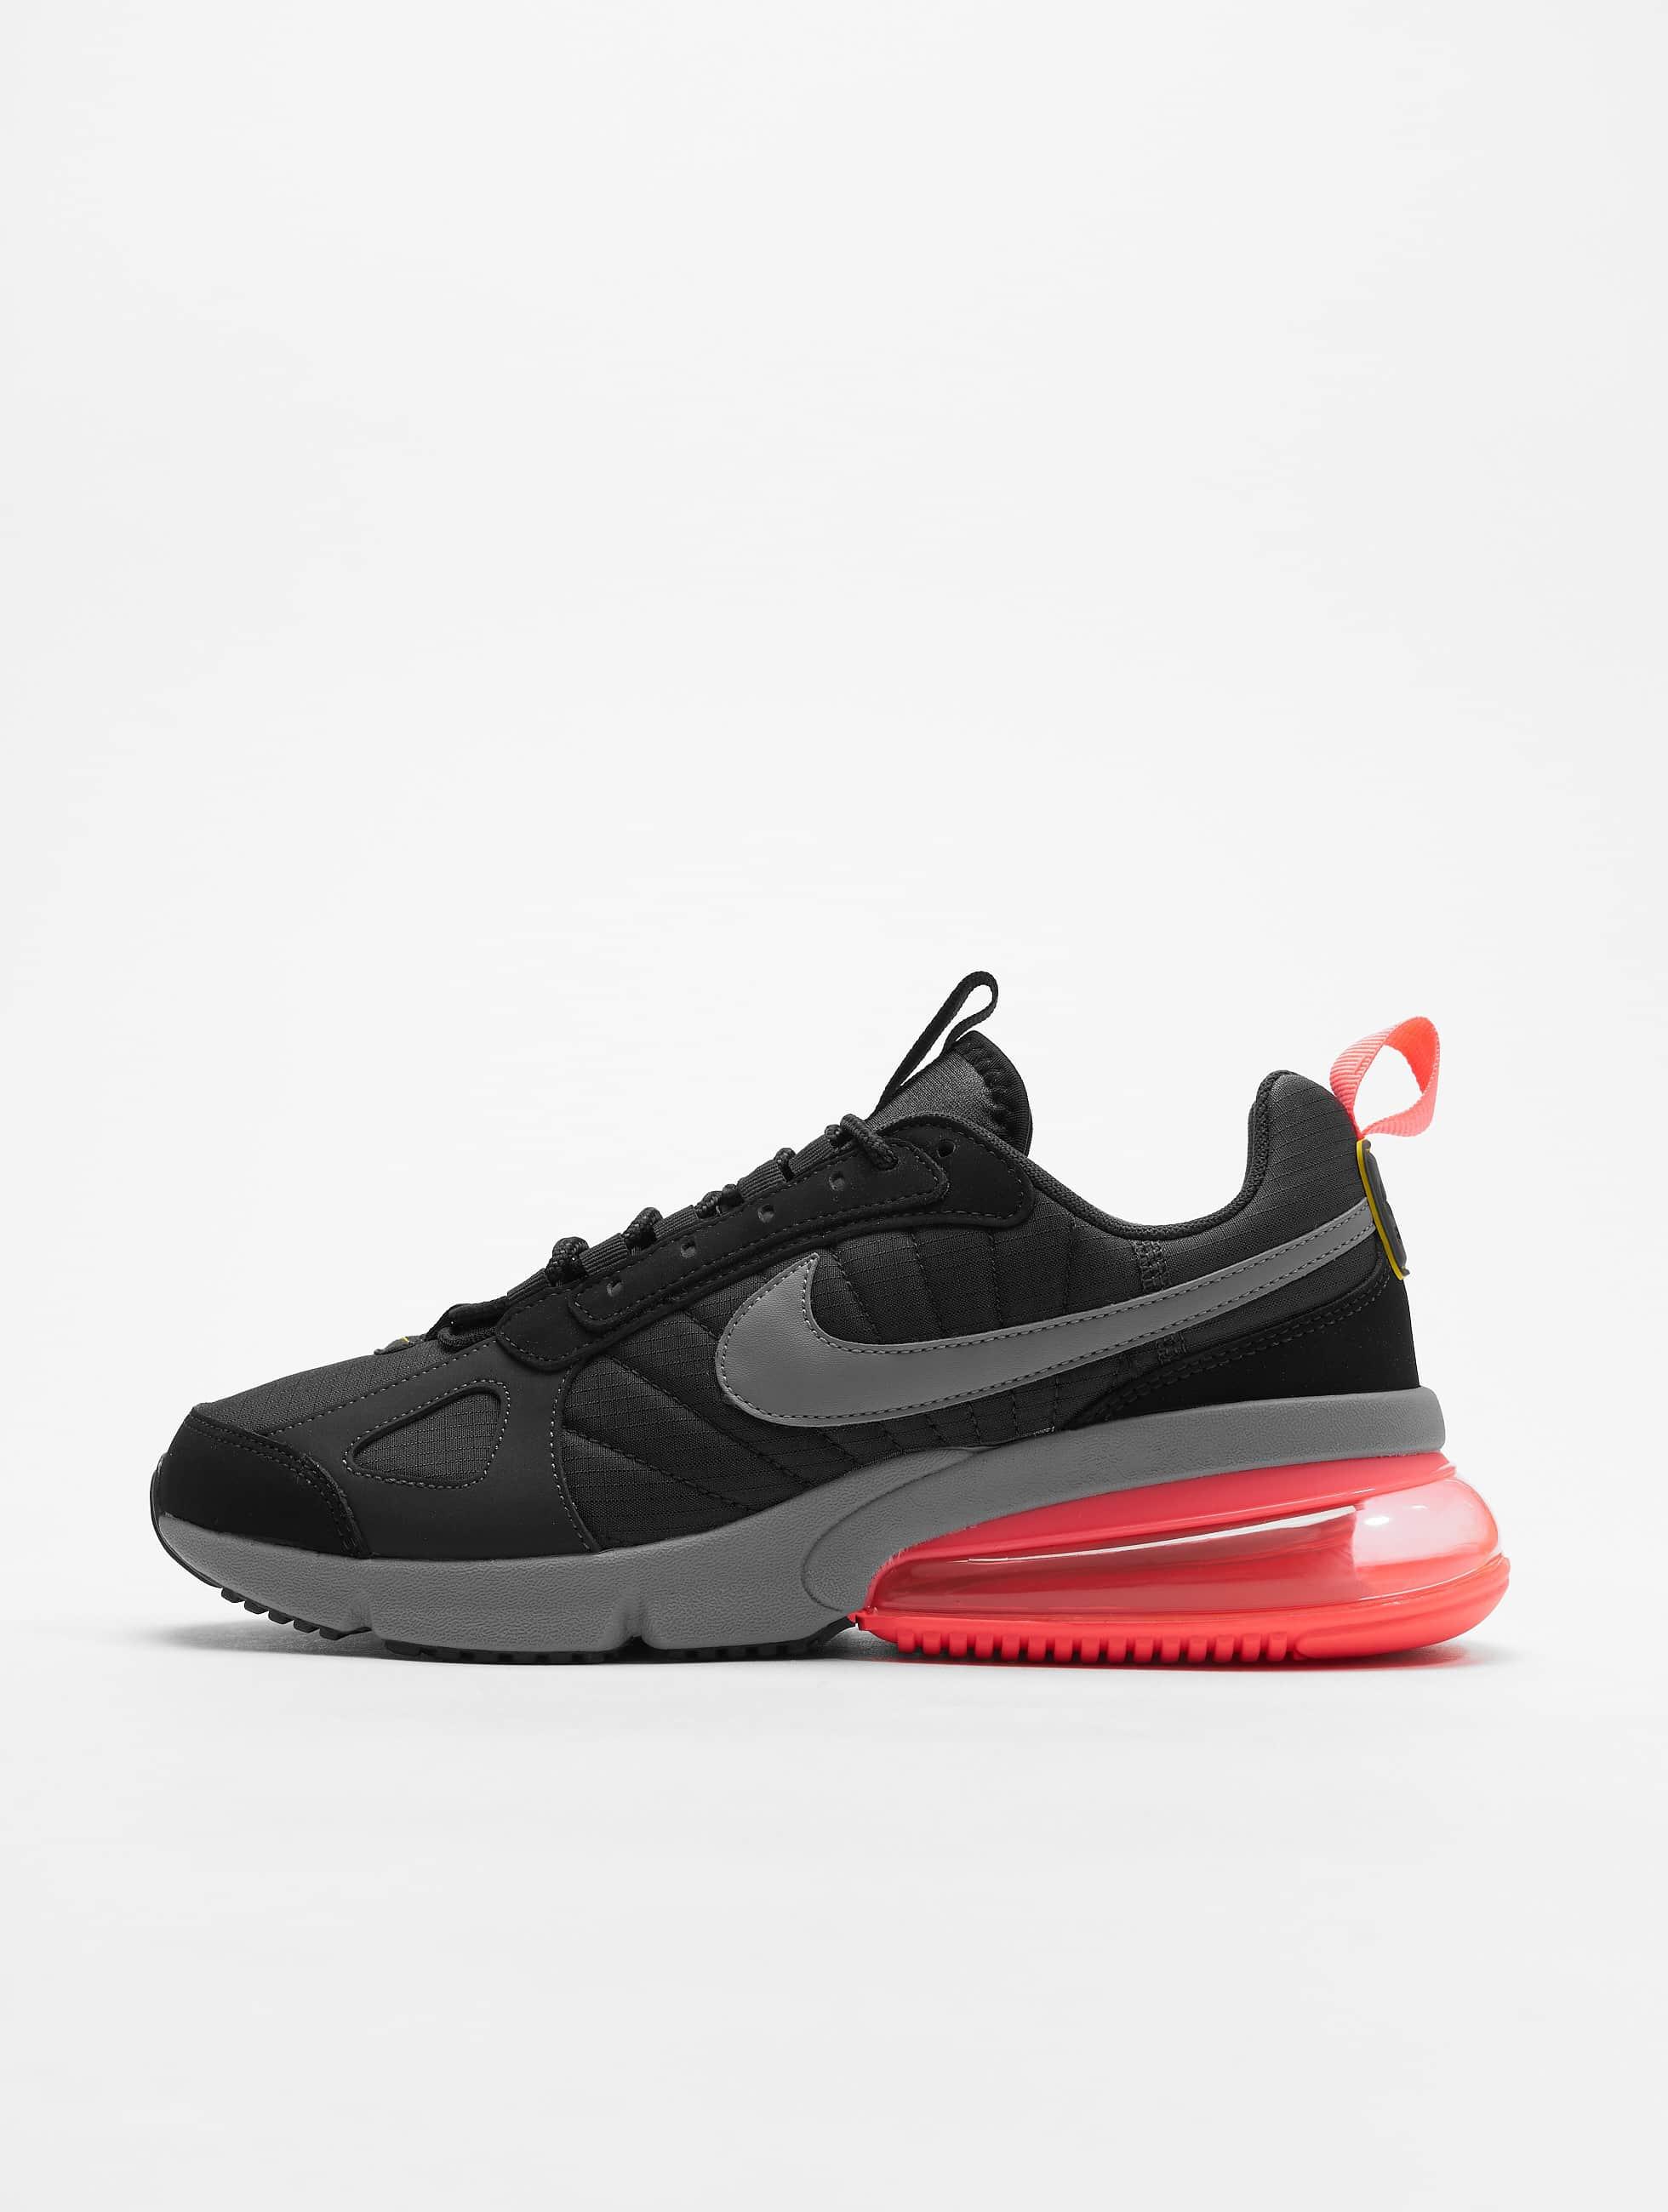 052c12931db Nike schoen / sneaker Air Max 270 Futura in zwart 587770